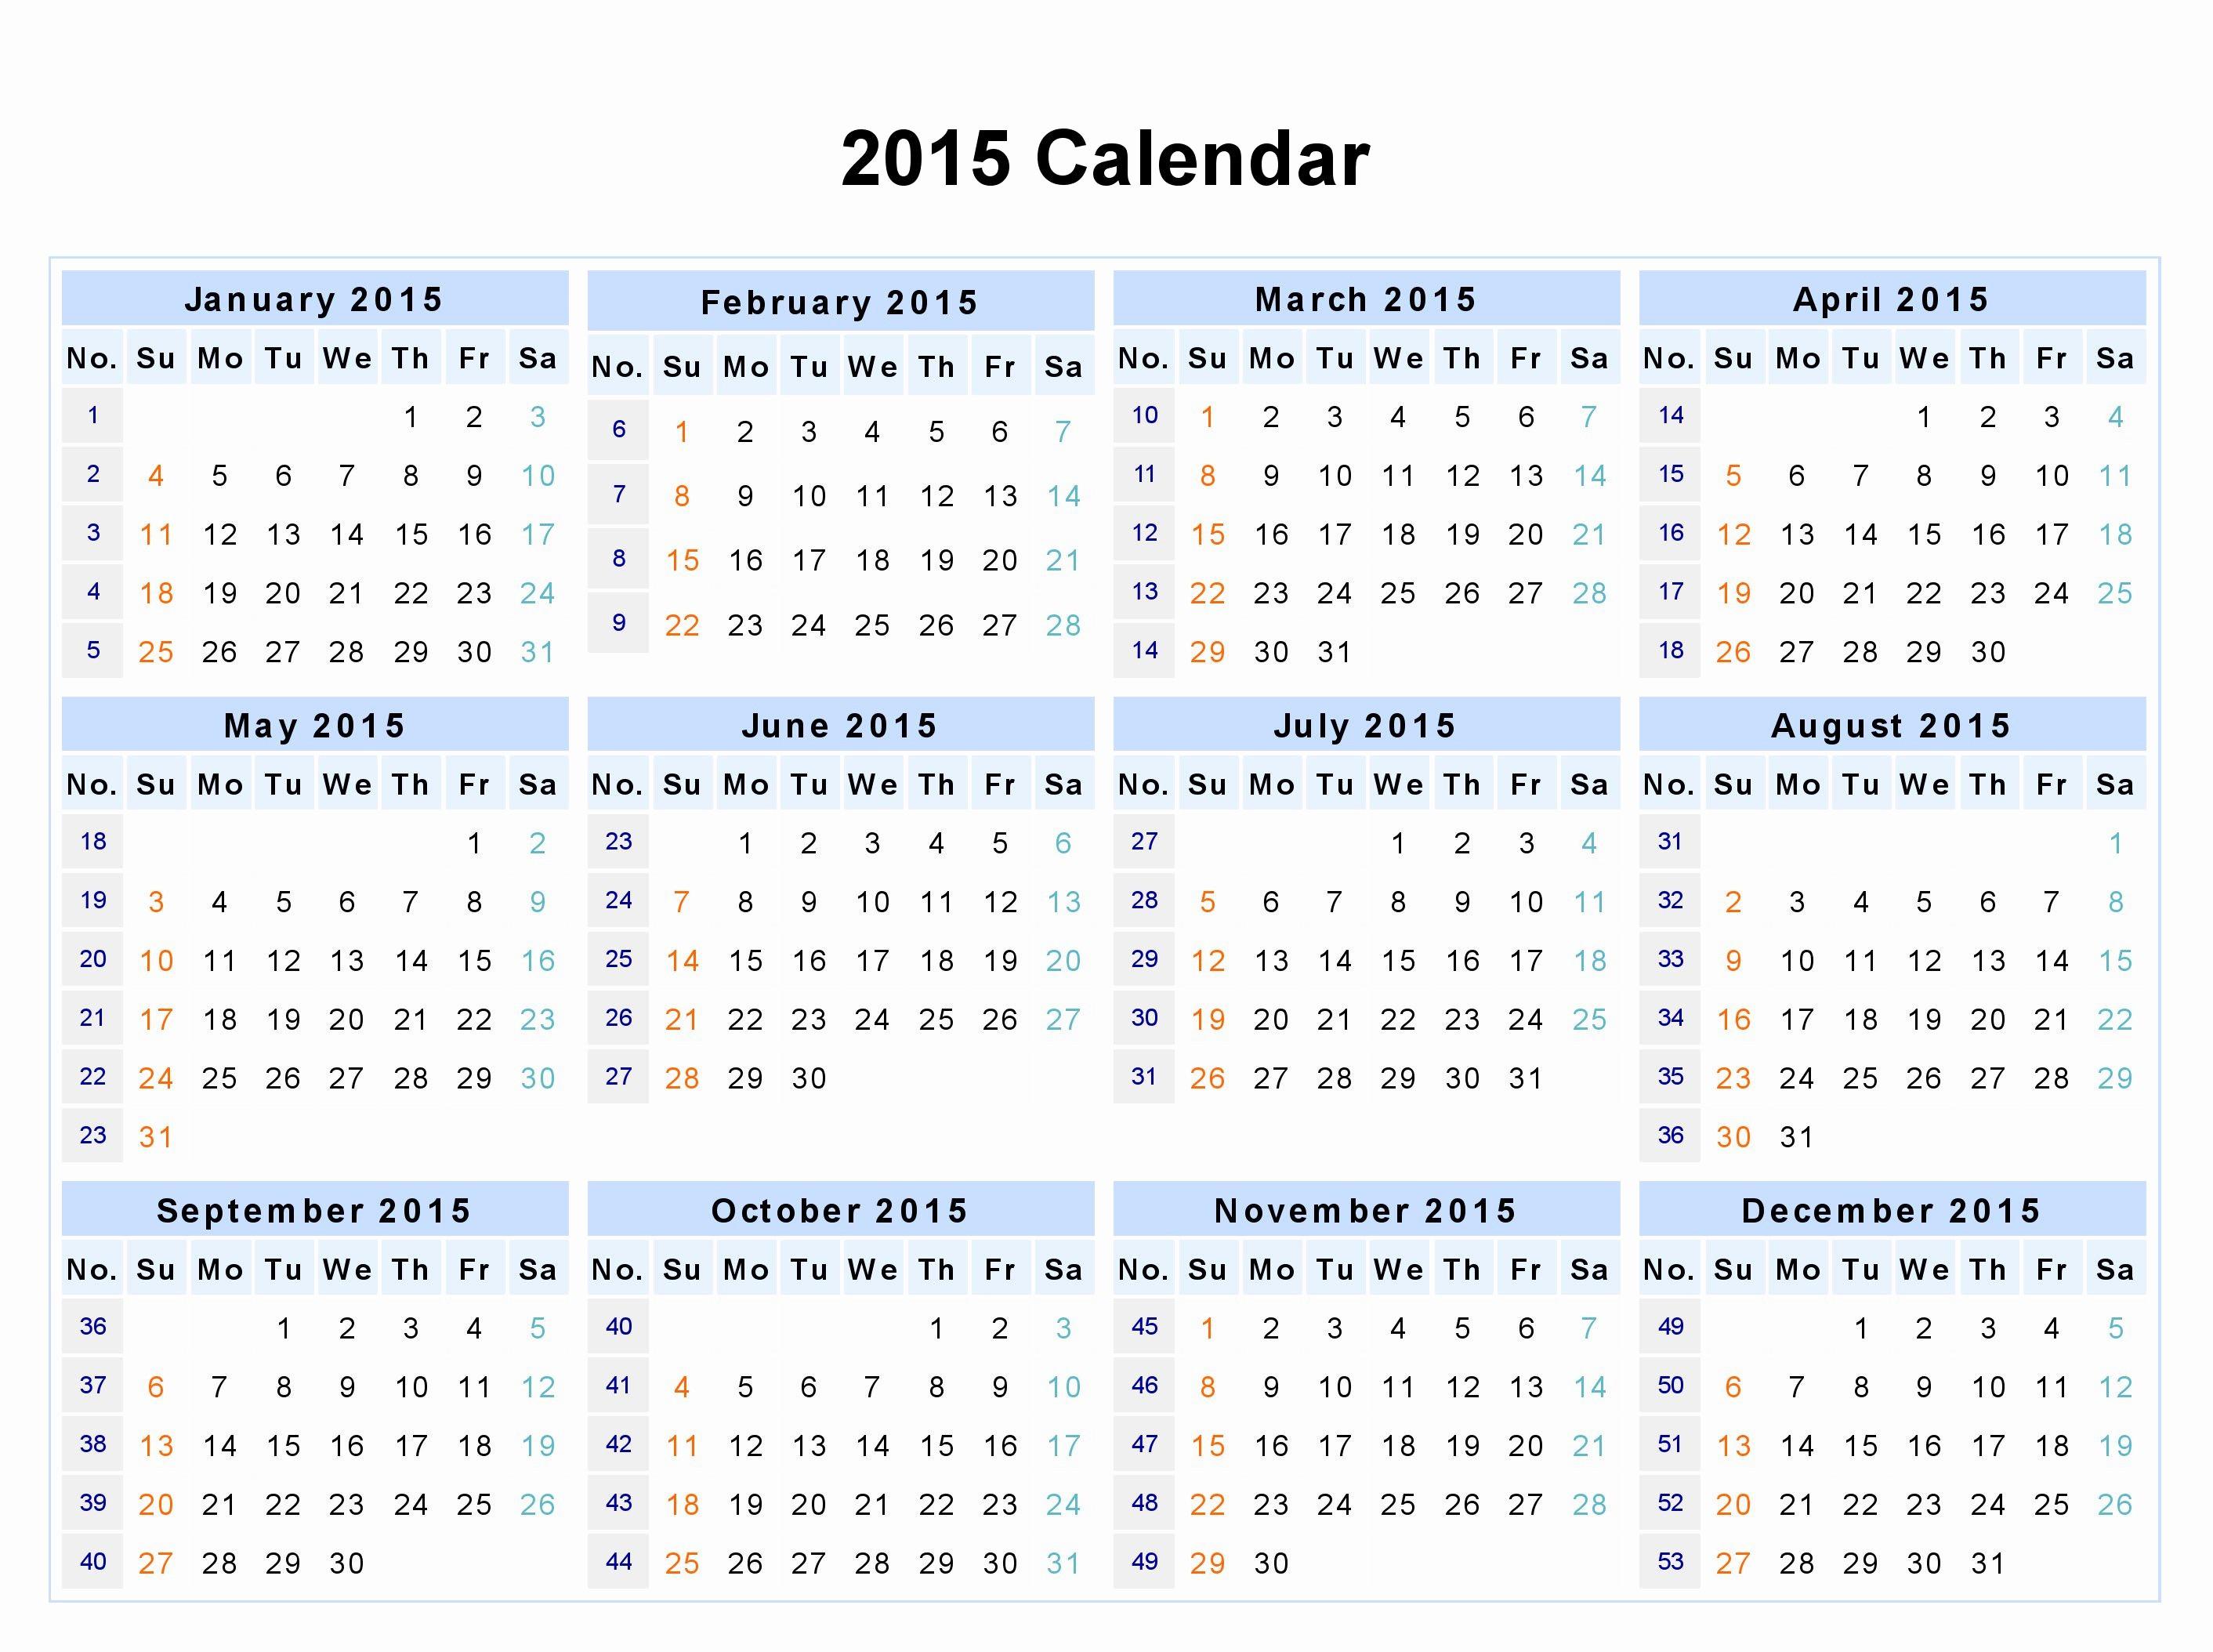 Free Printable 12 Month Calendar Inspirational 12 Month Calendar 2015 Google Search